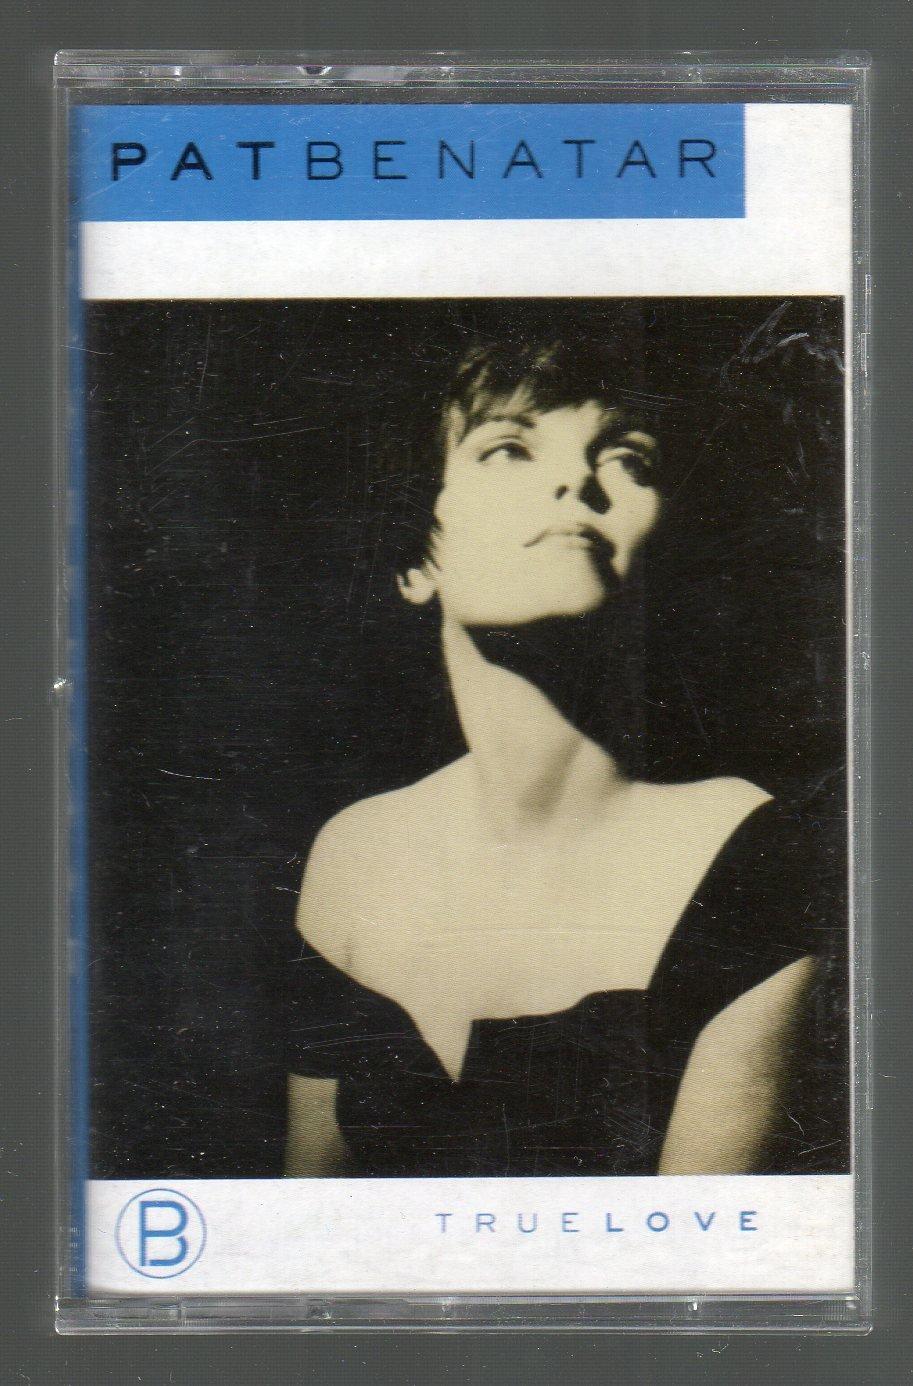 Pat Benatar - True Love Cassette Tape